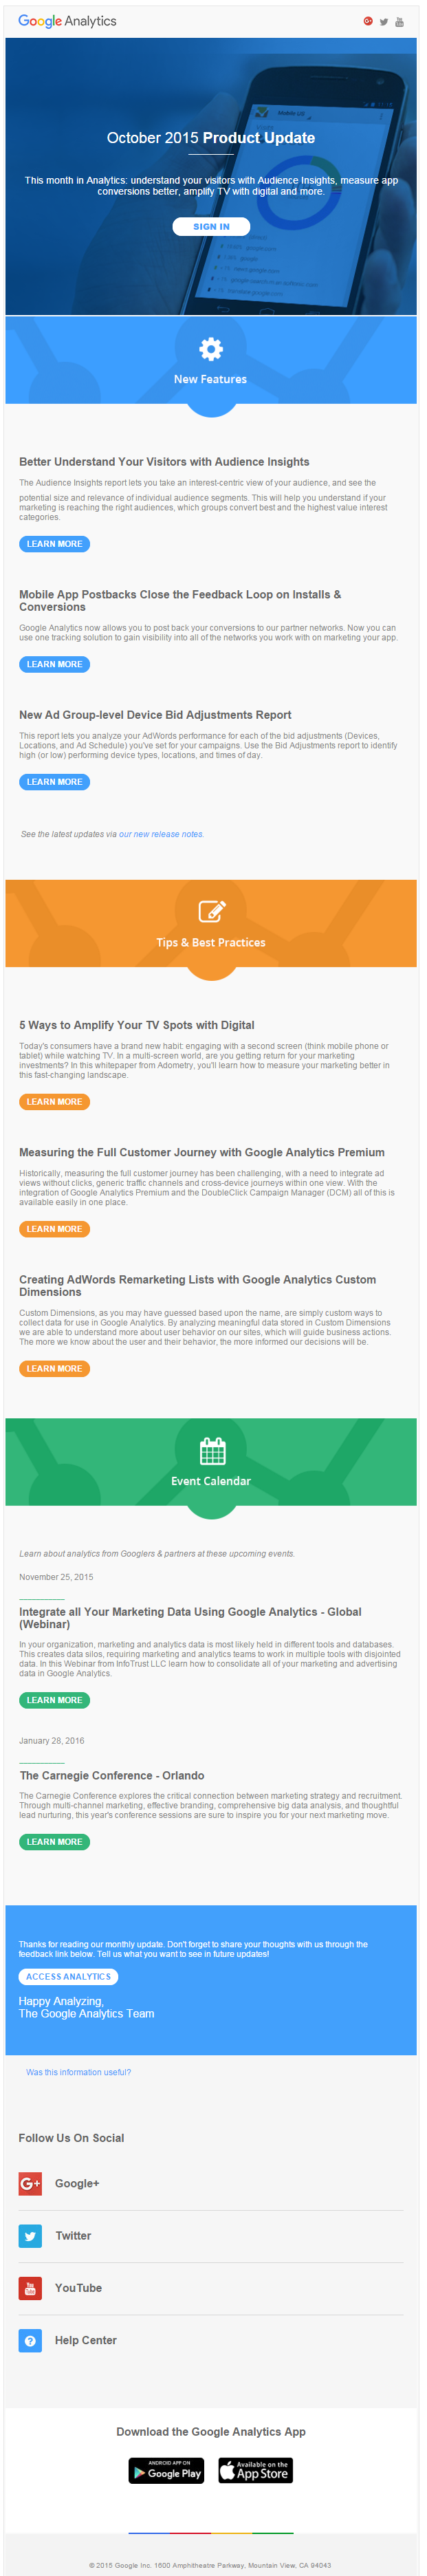 Google Analytics welcome email 2015